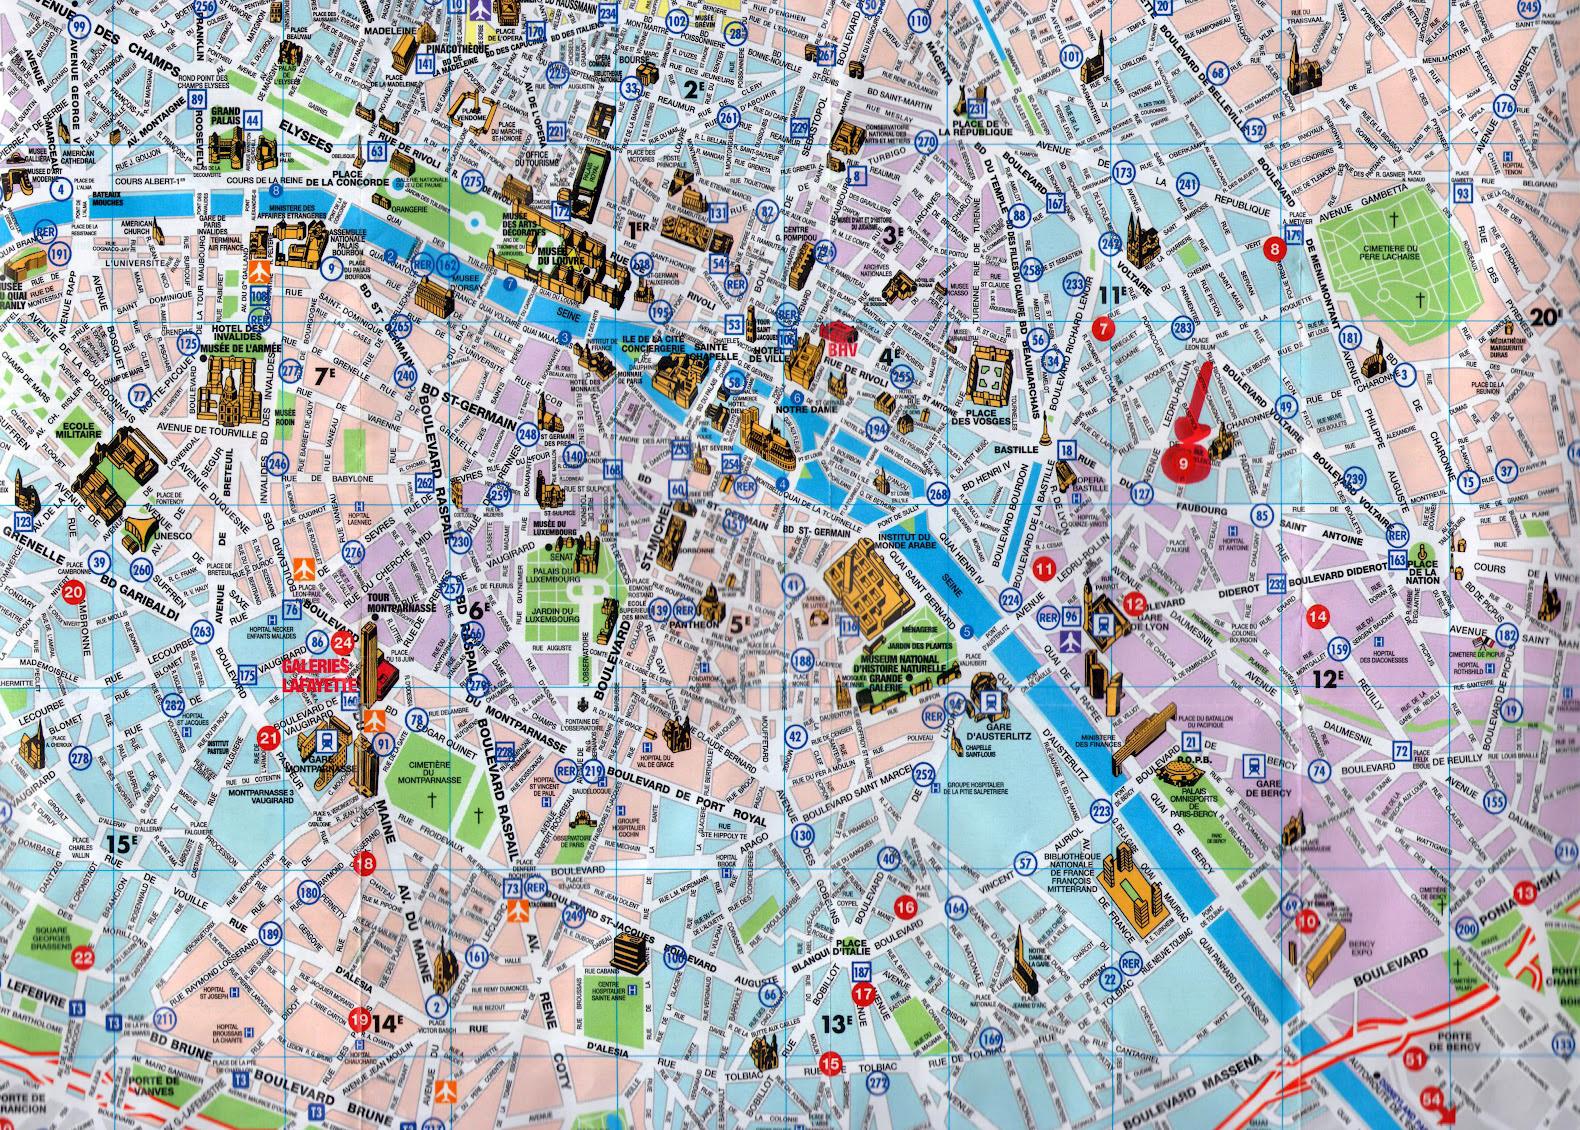 detailed tourist map of central part of paris city